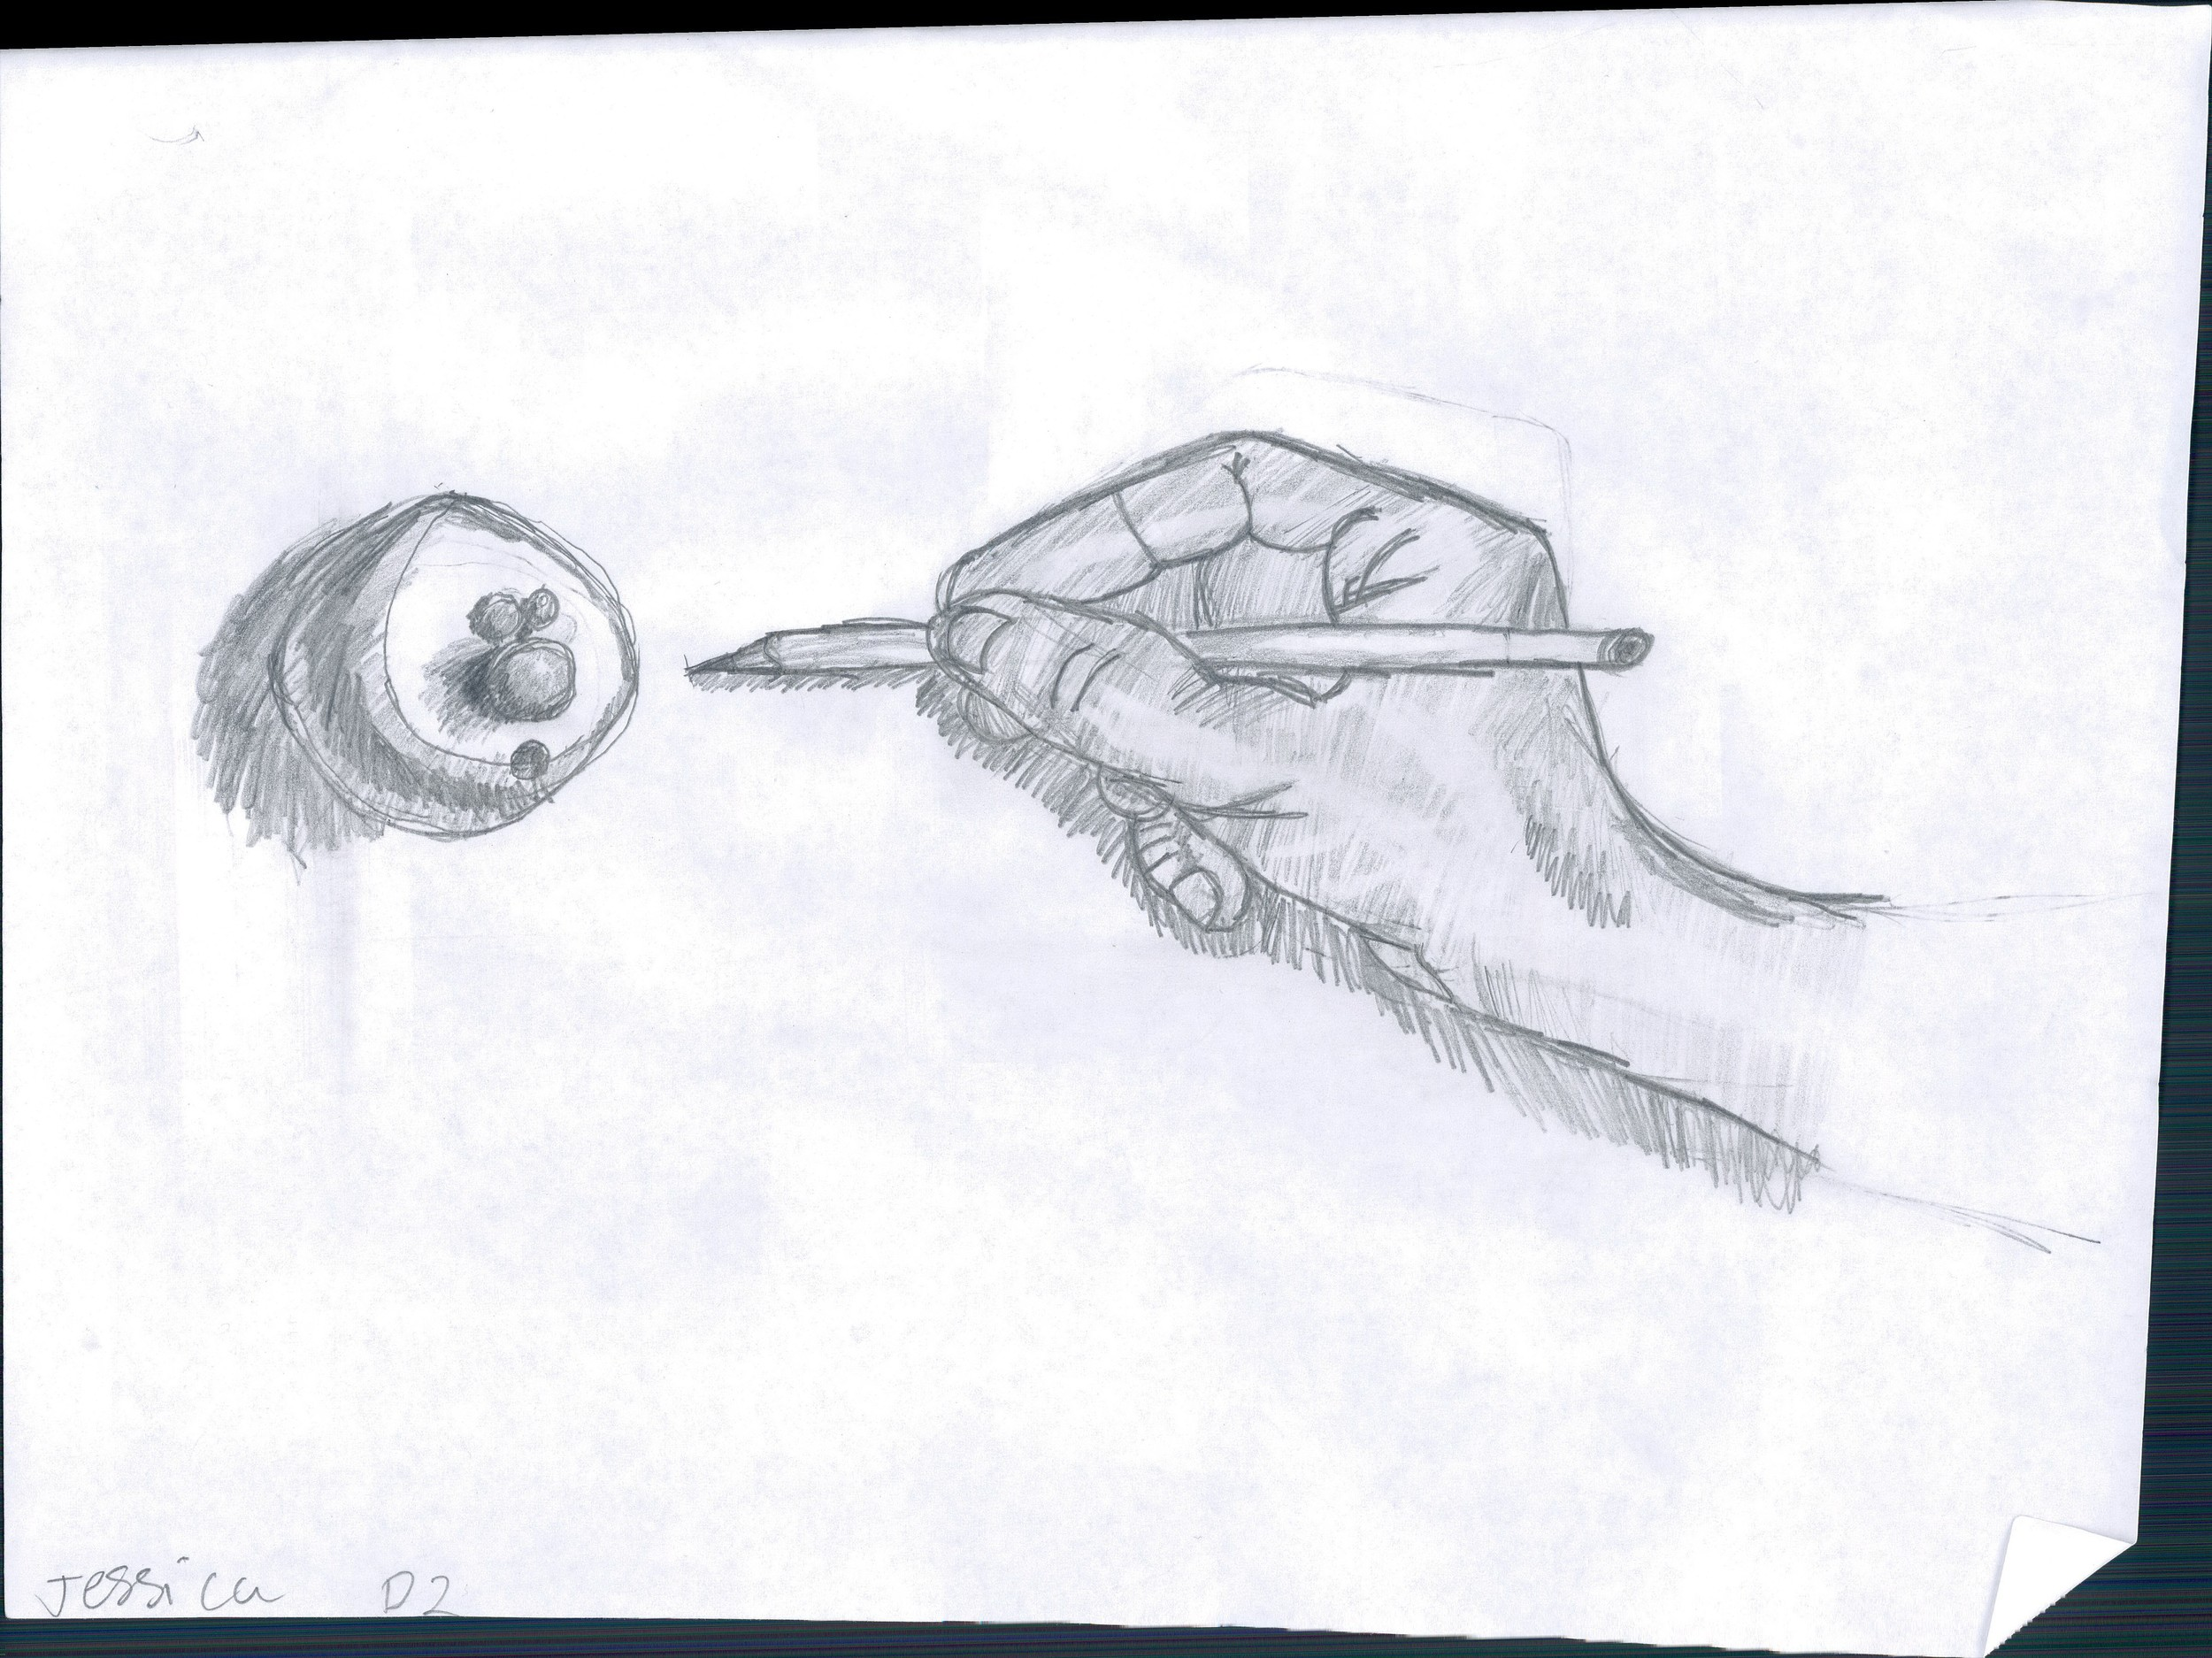 2011 November, Pencil